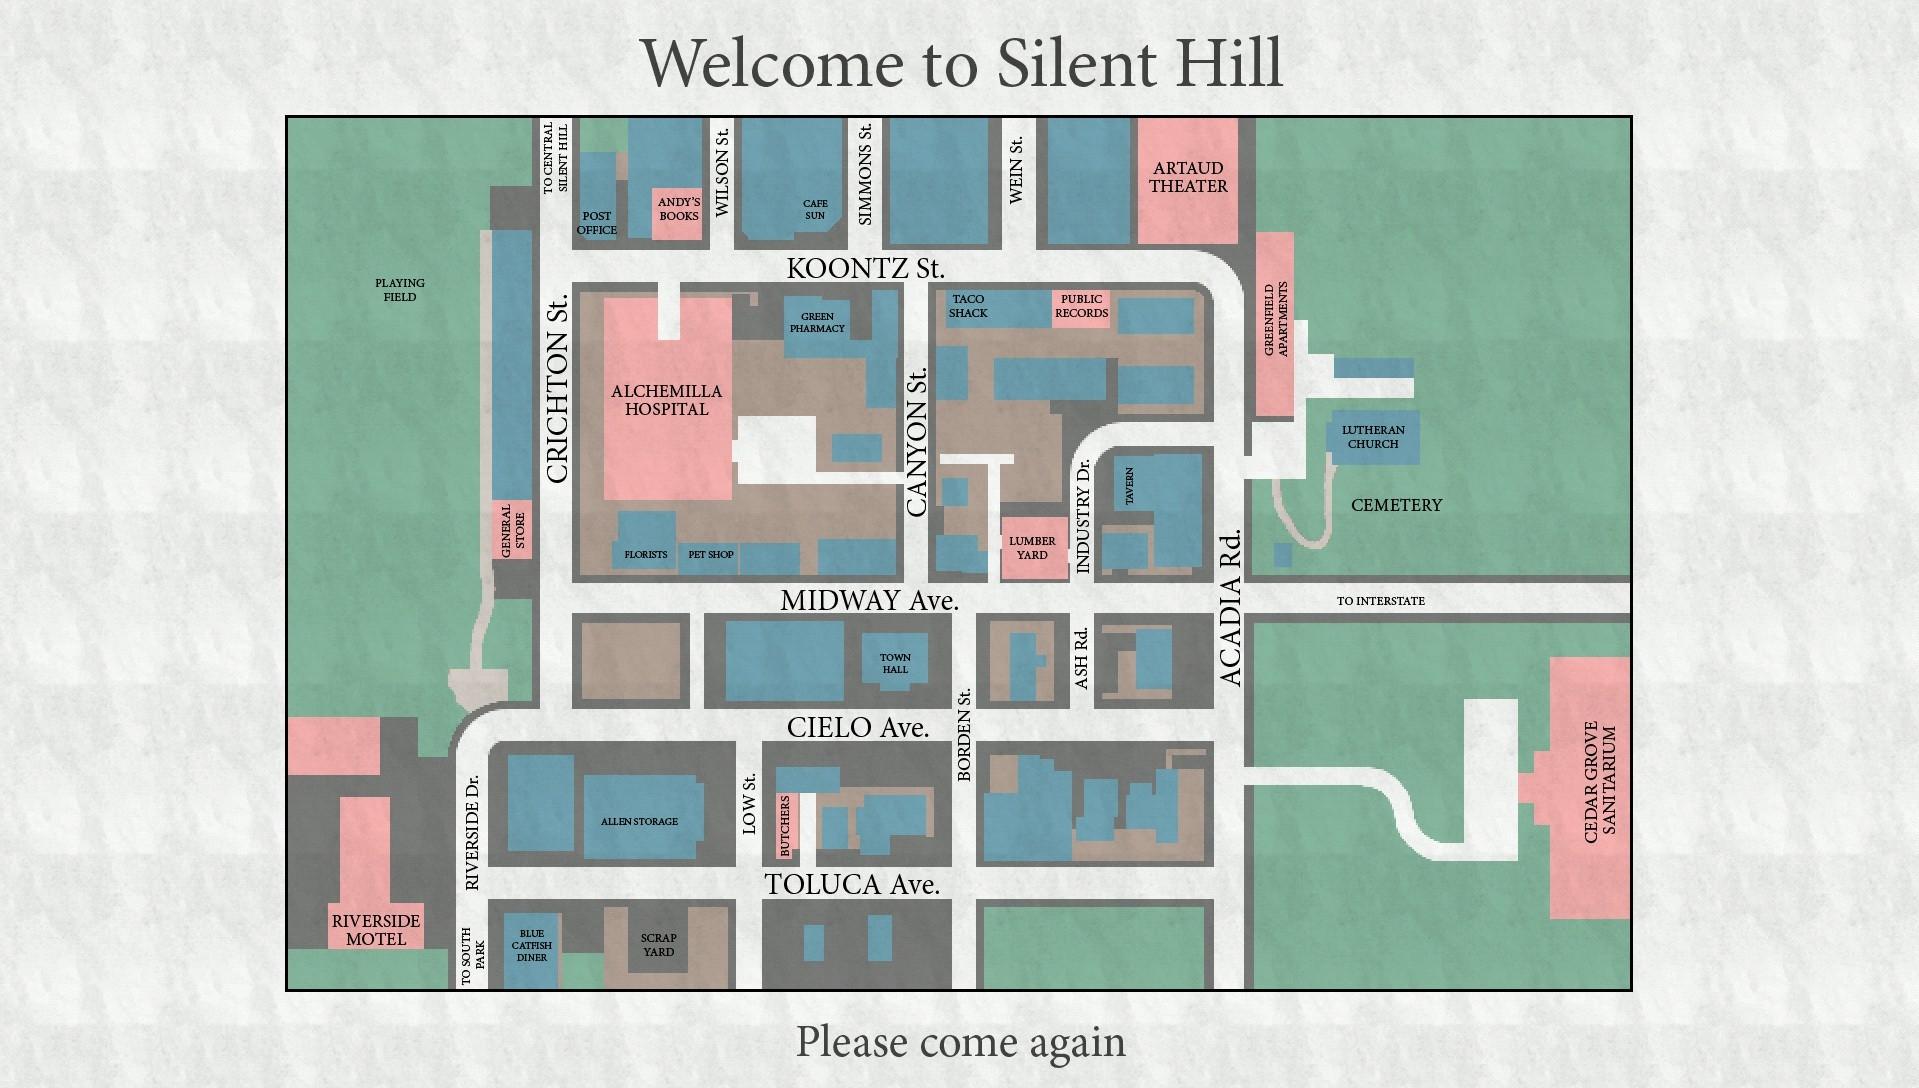 Wallpaper : drawing, video games, interior design, Silent Hill ...